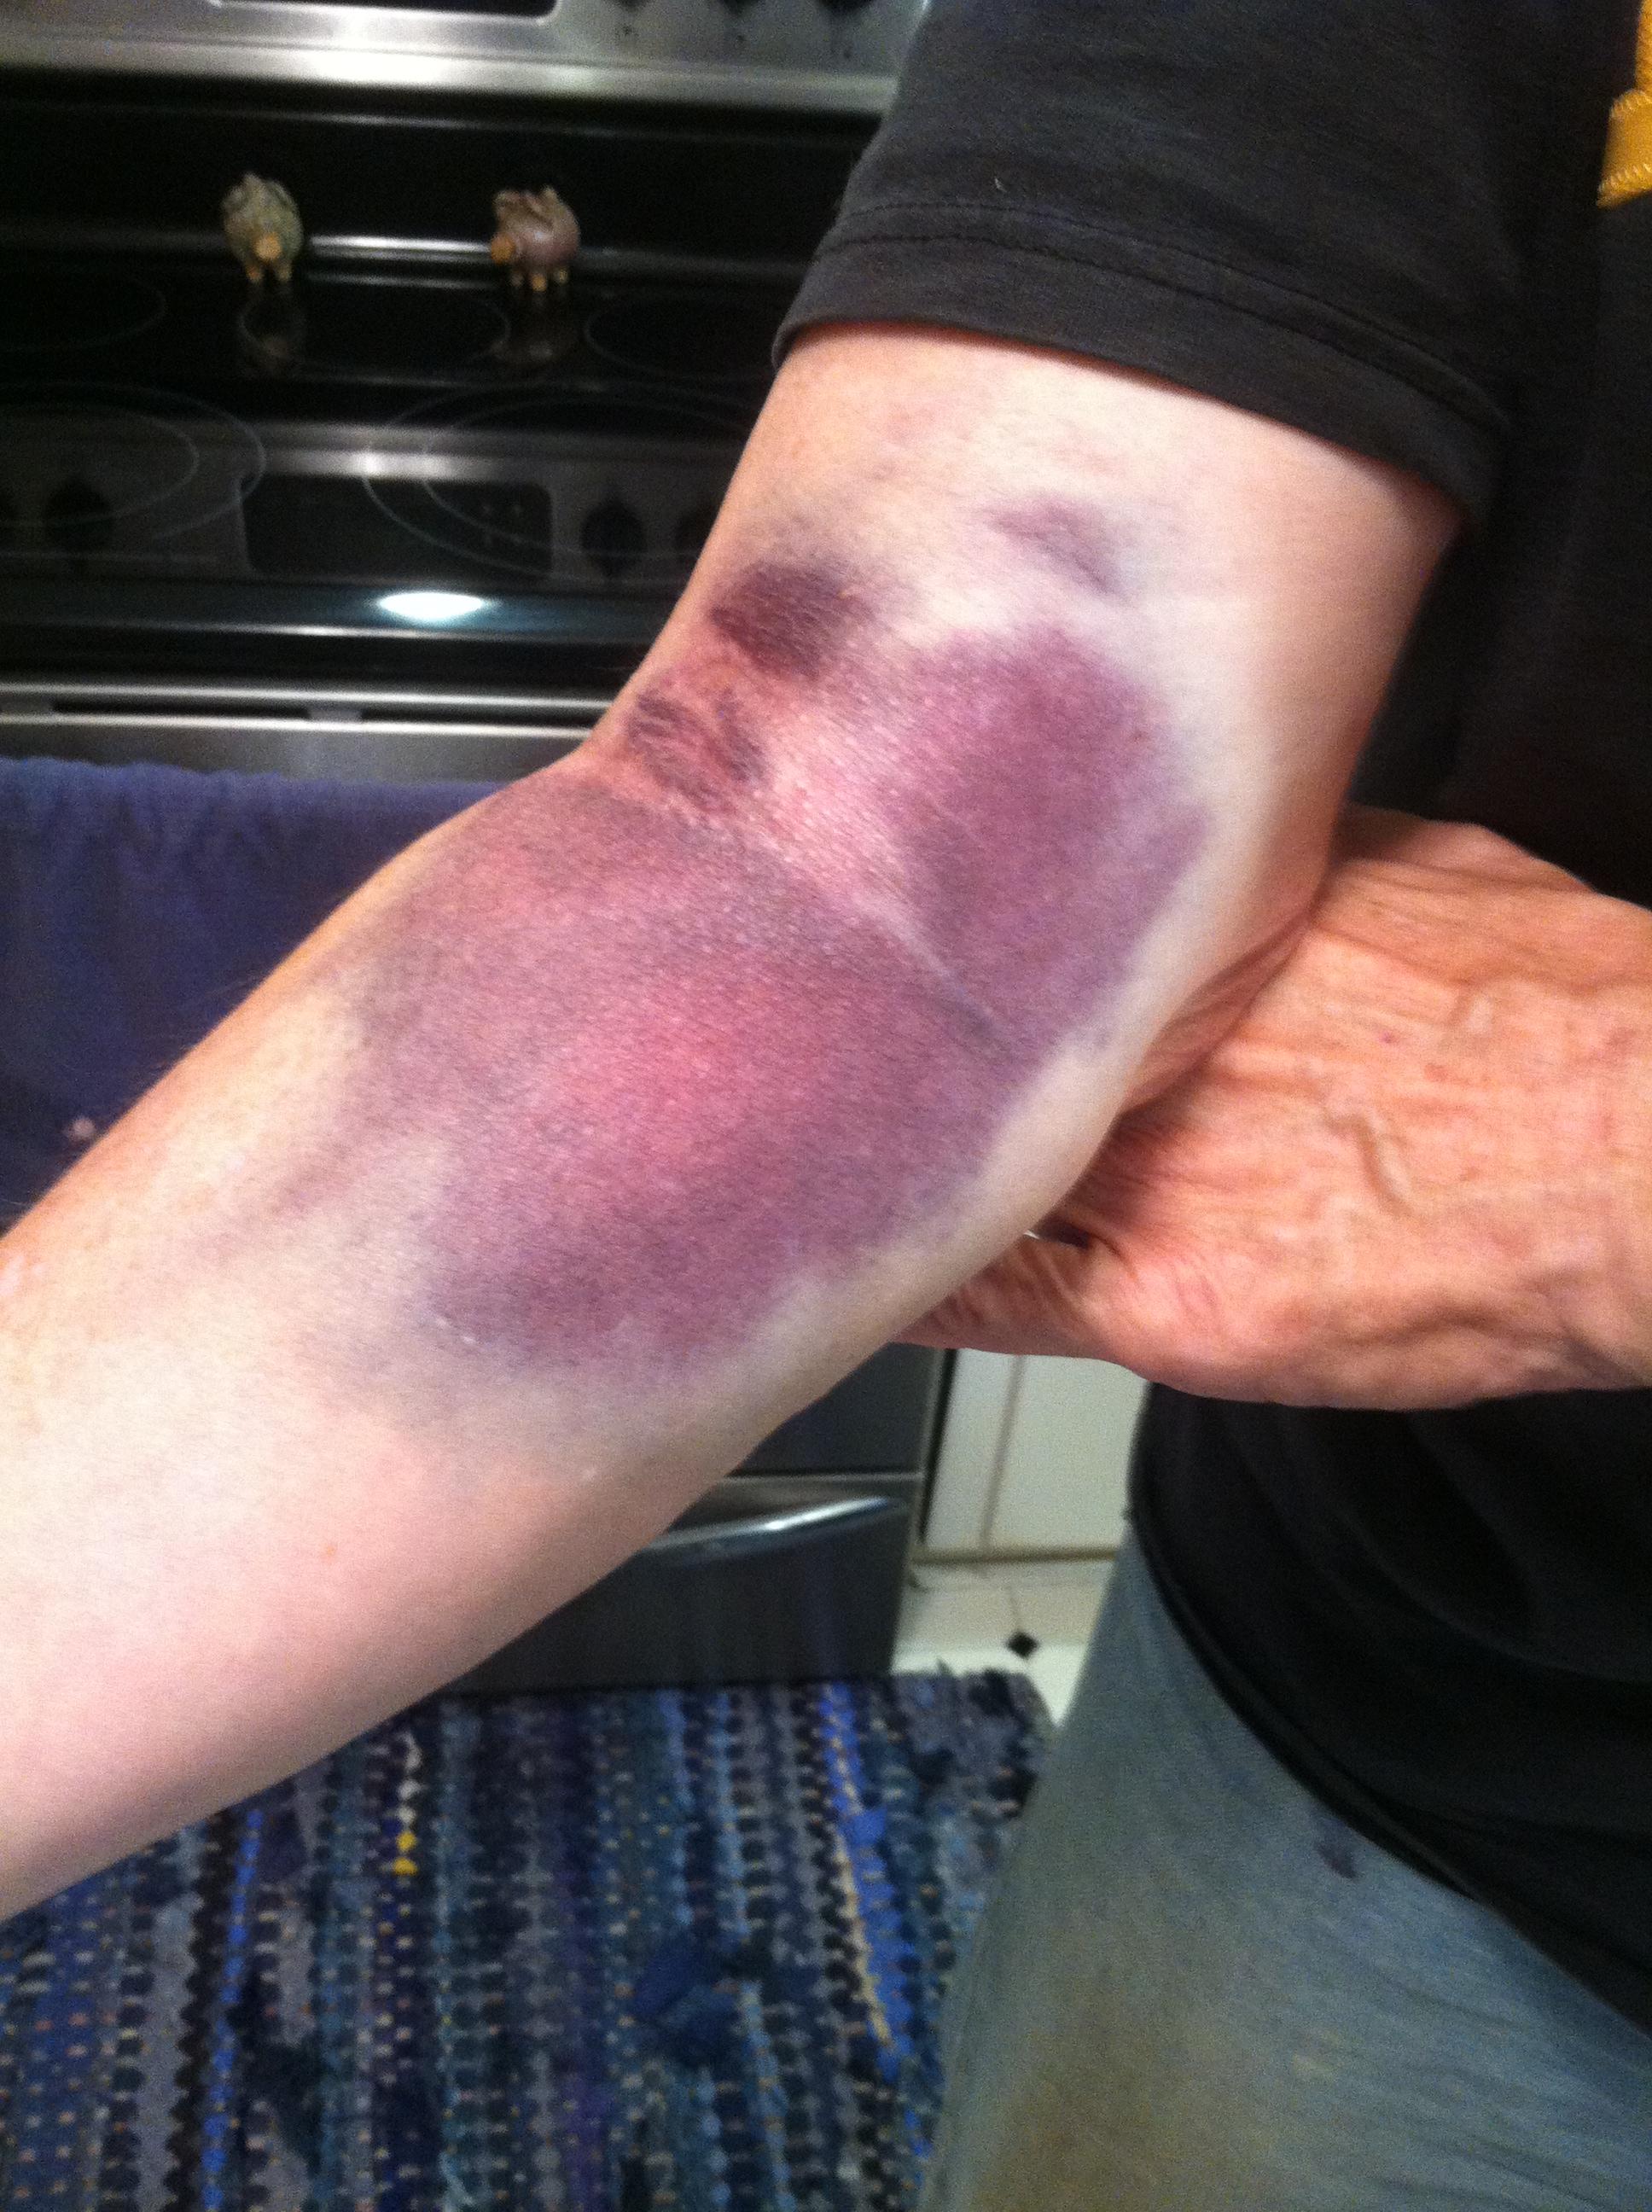 Initial bruise